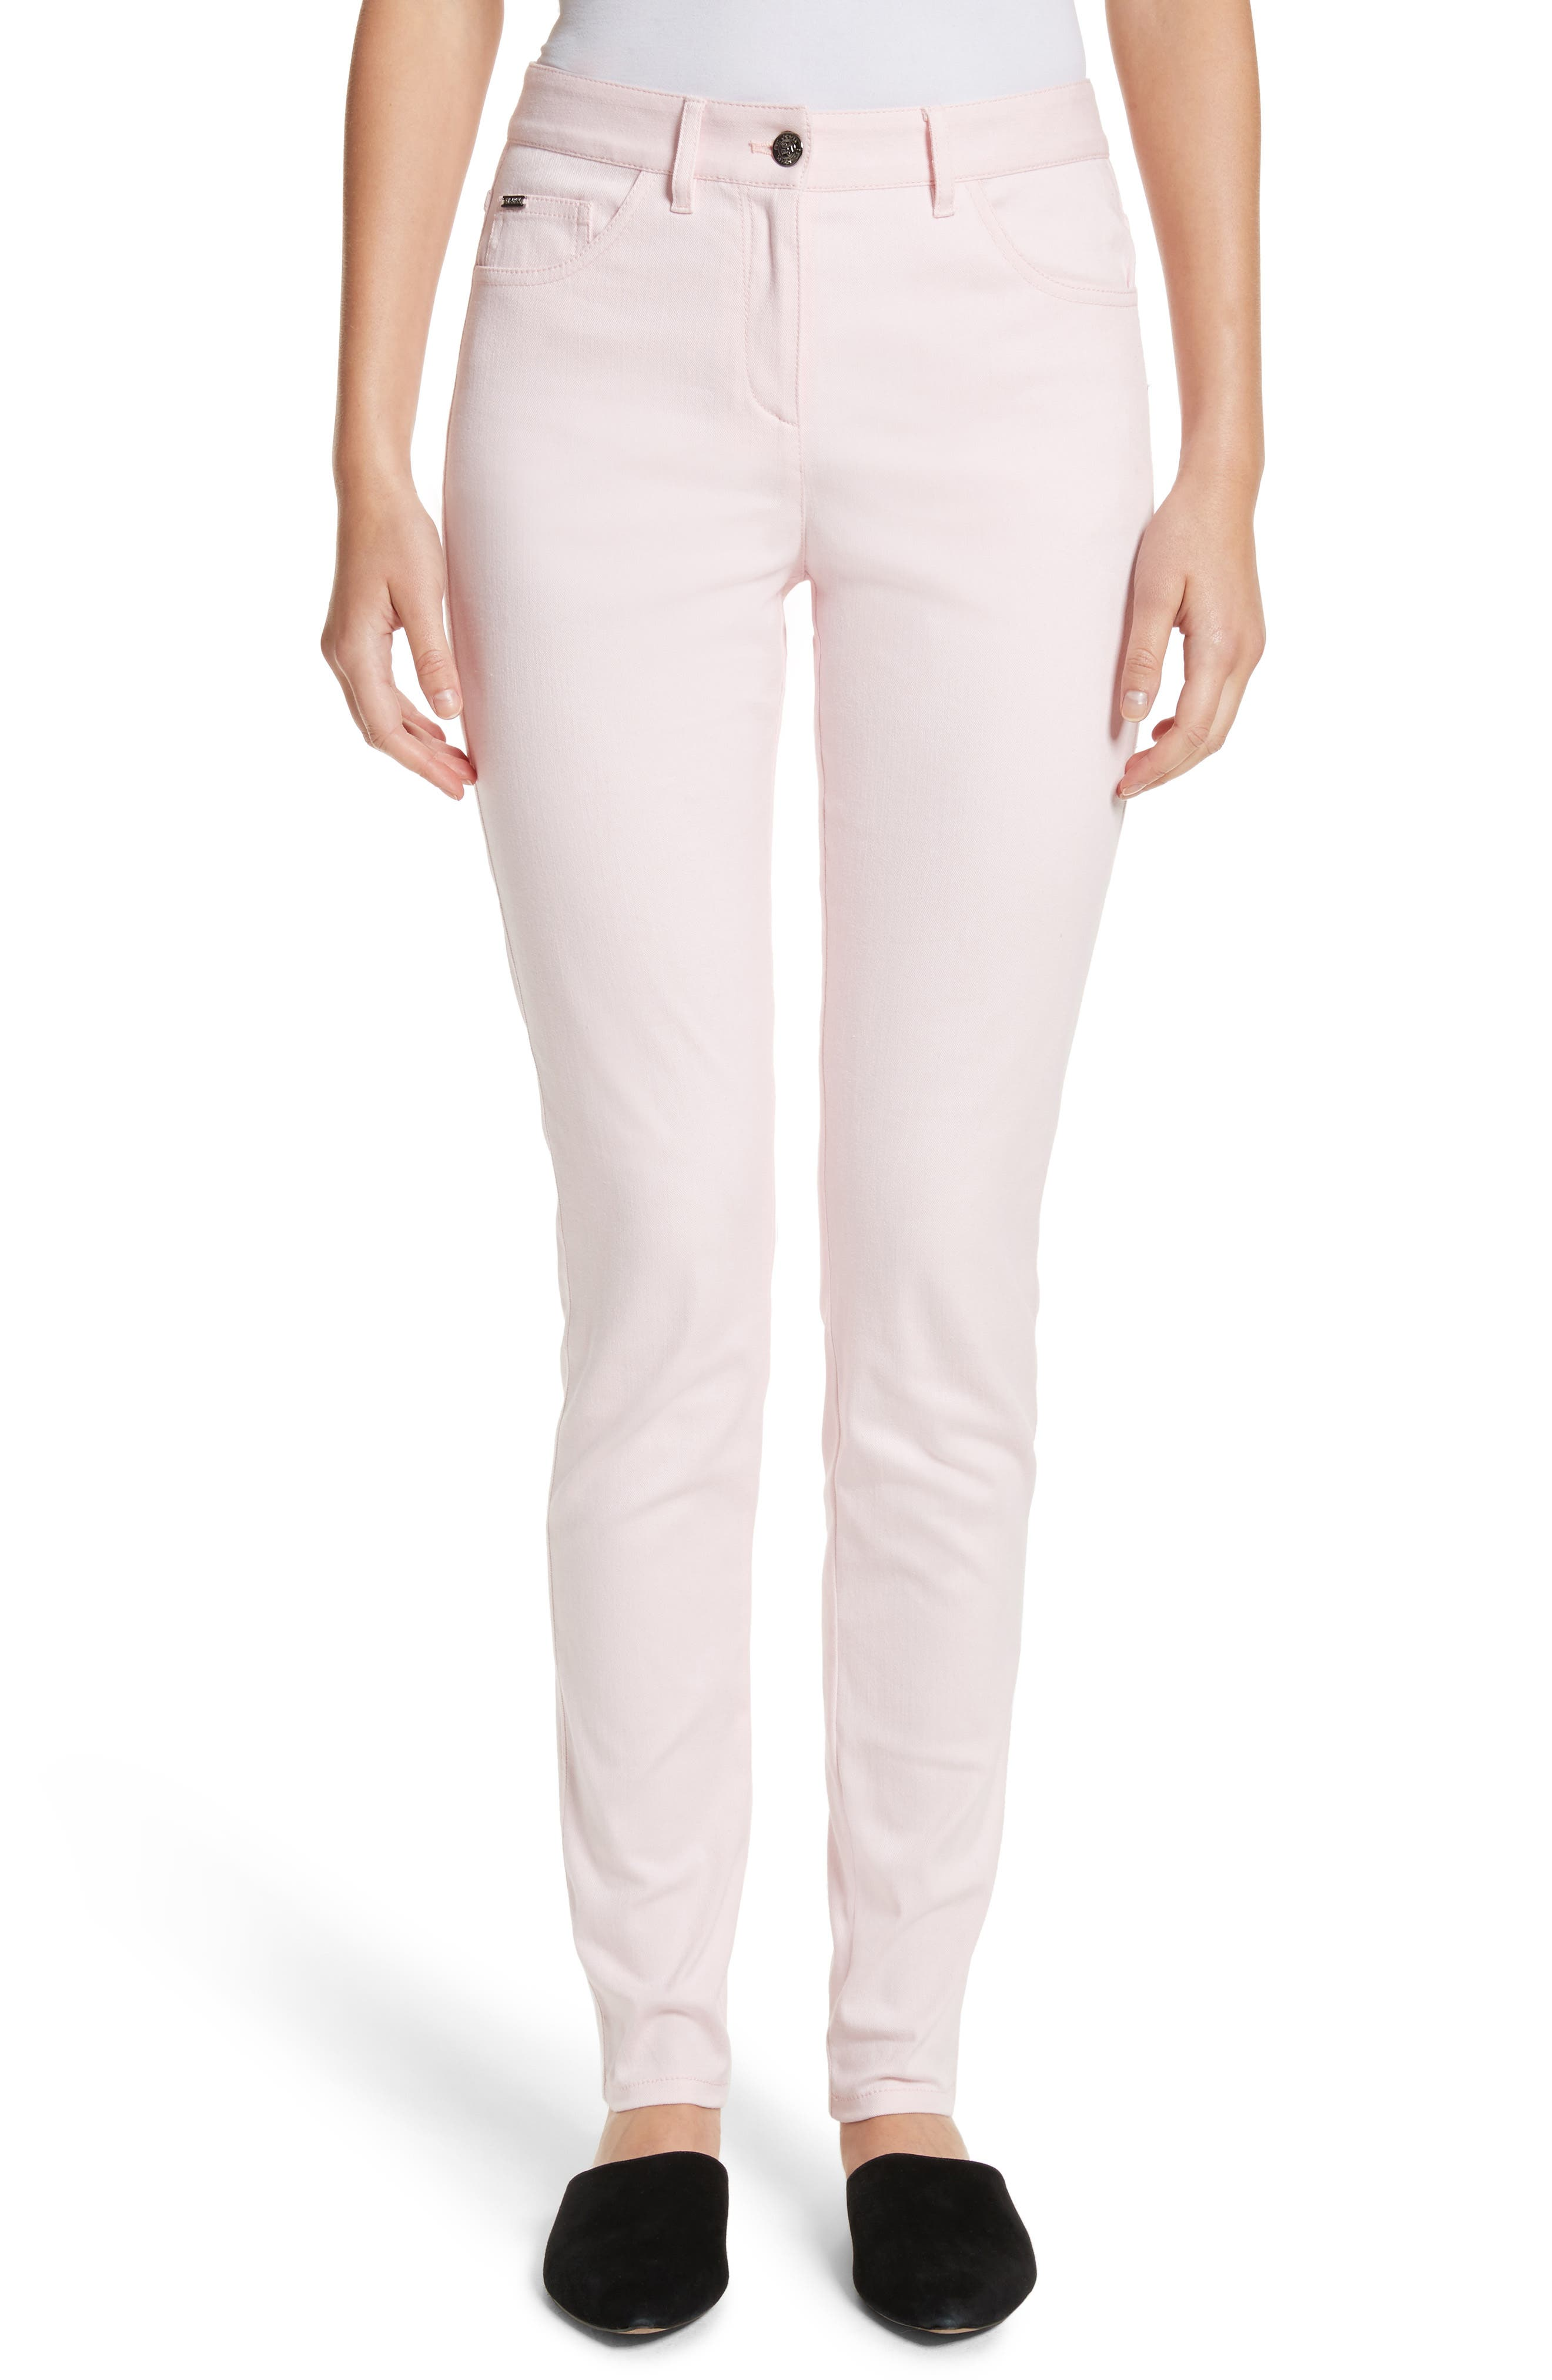 Alternate Image 1 Selected - St. John Collection Bardot Double Dye Stretch Jeans